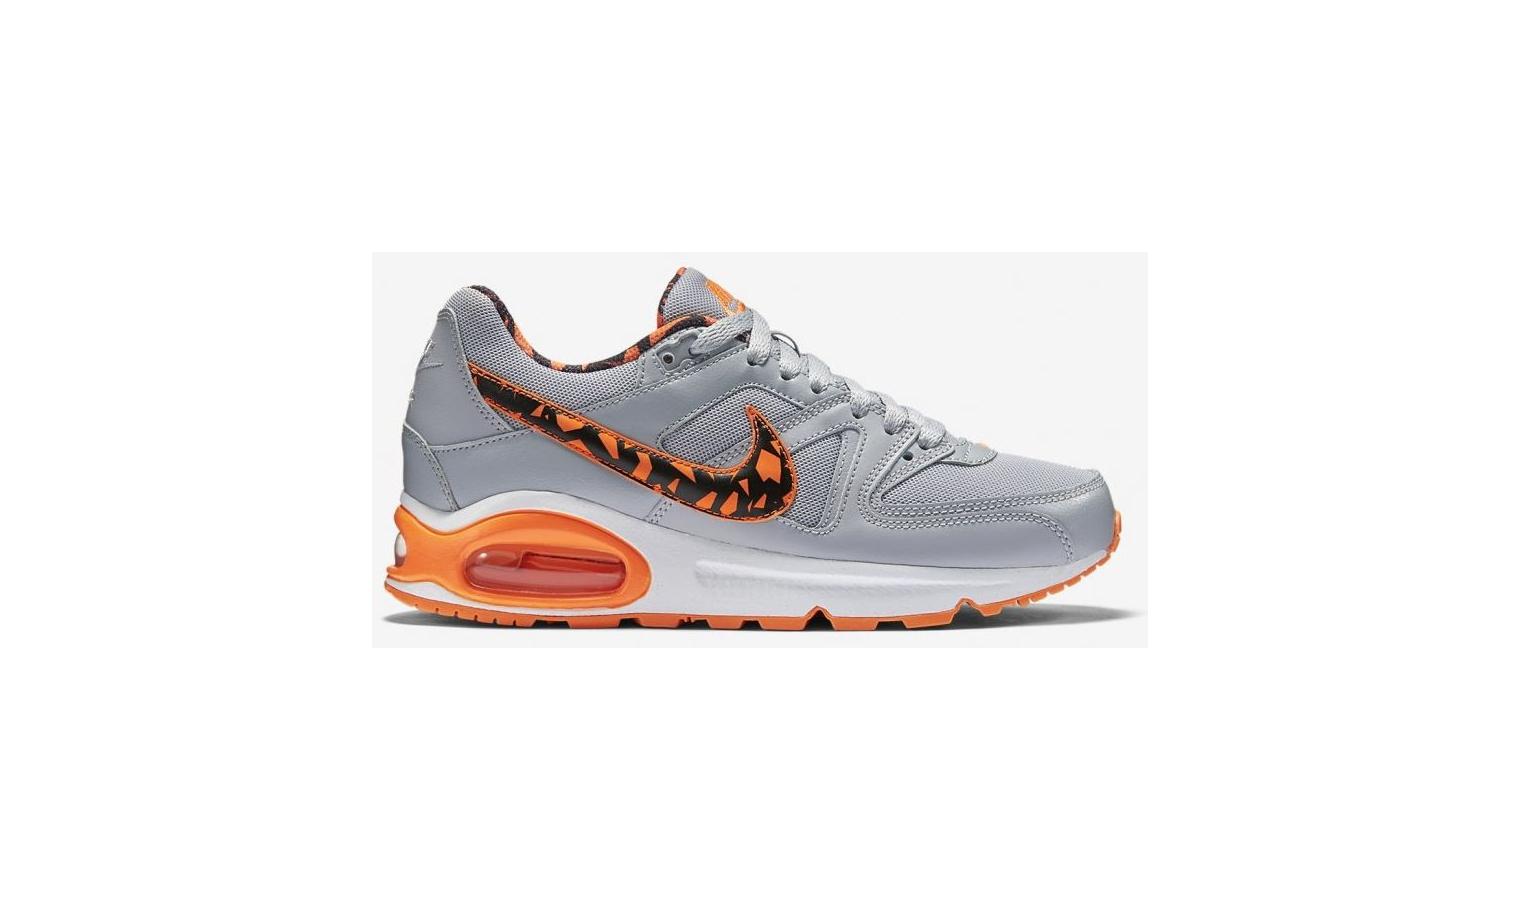 Dětské boty Nike AIR MAX COMMAND (GS) šedé  265fc2e4dfd